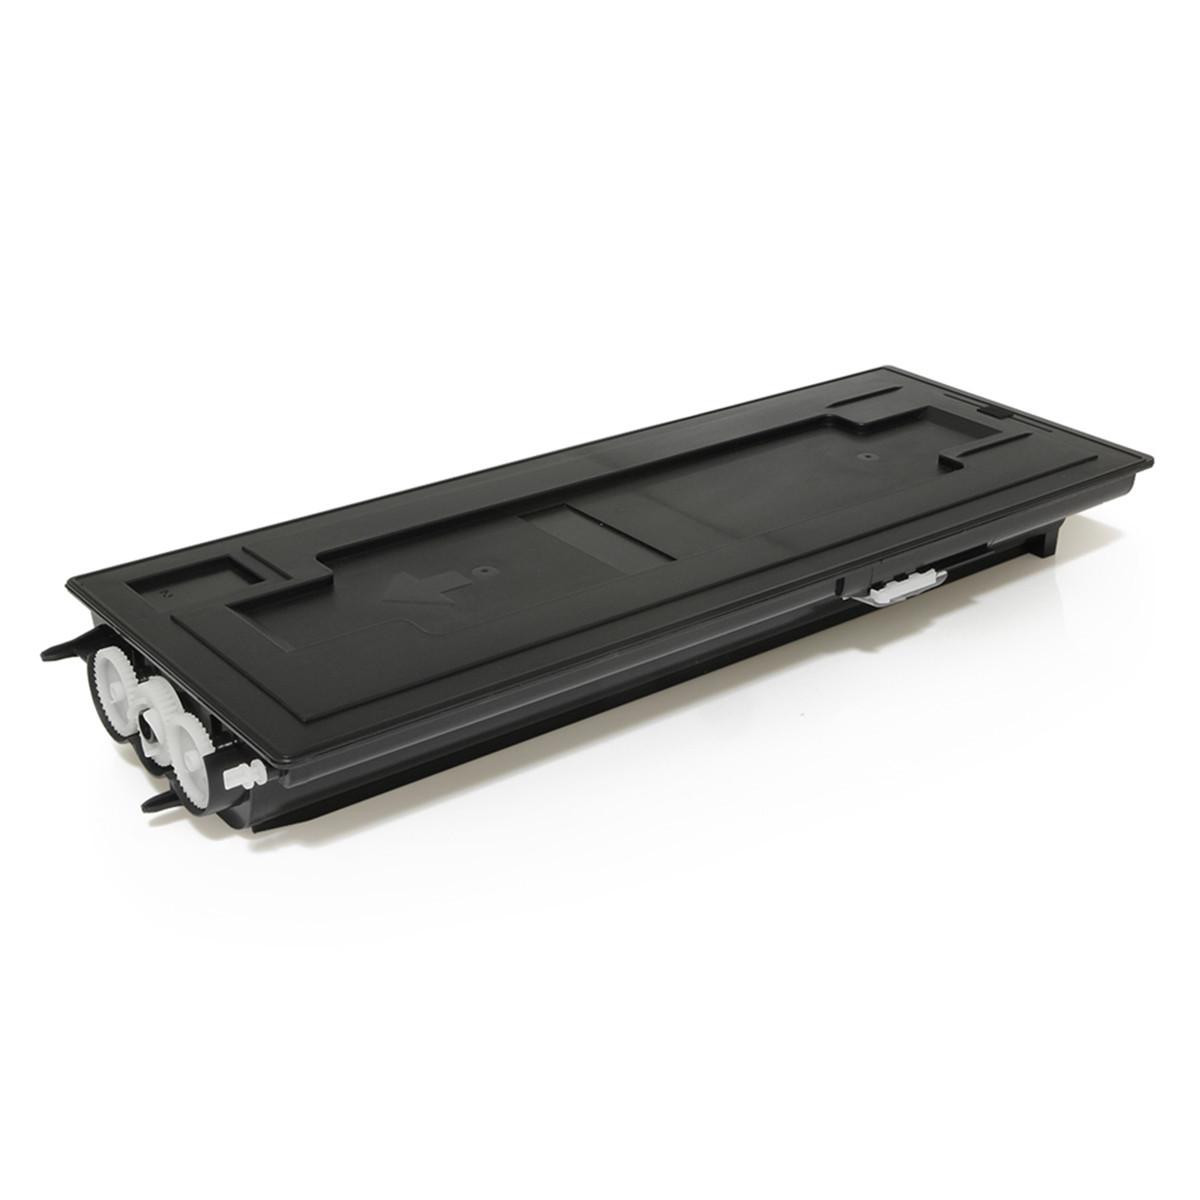 Toner Olivetti Lexikon D-COPIA 200MF | Katun Access 15k